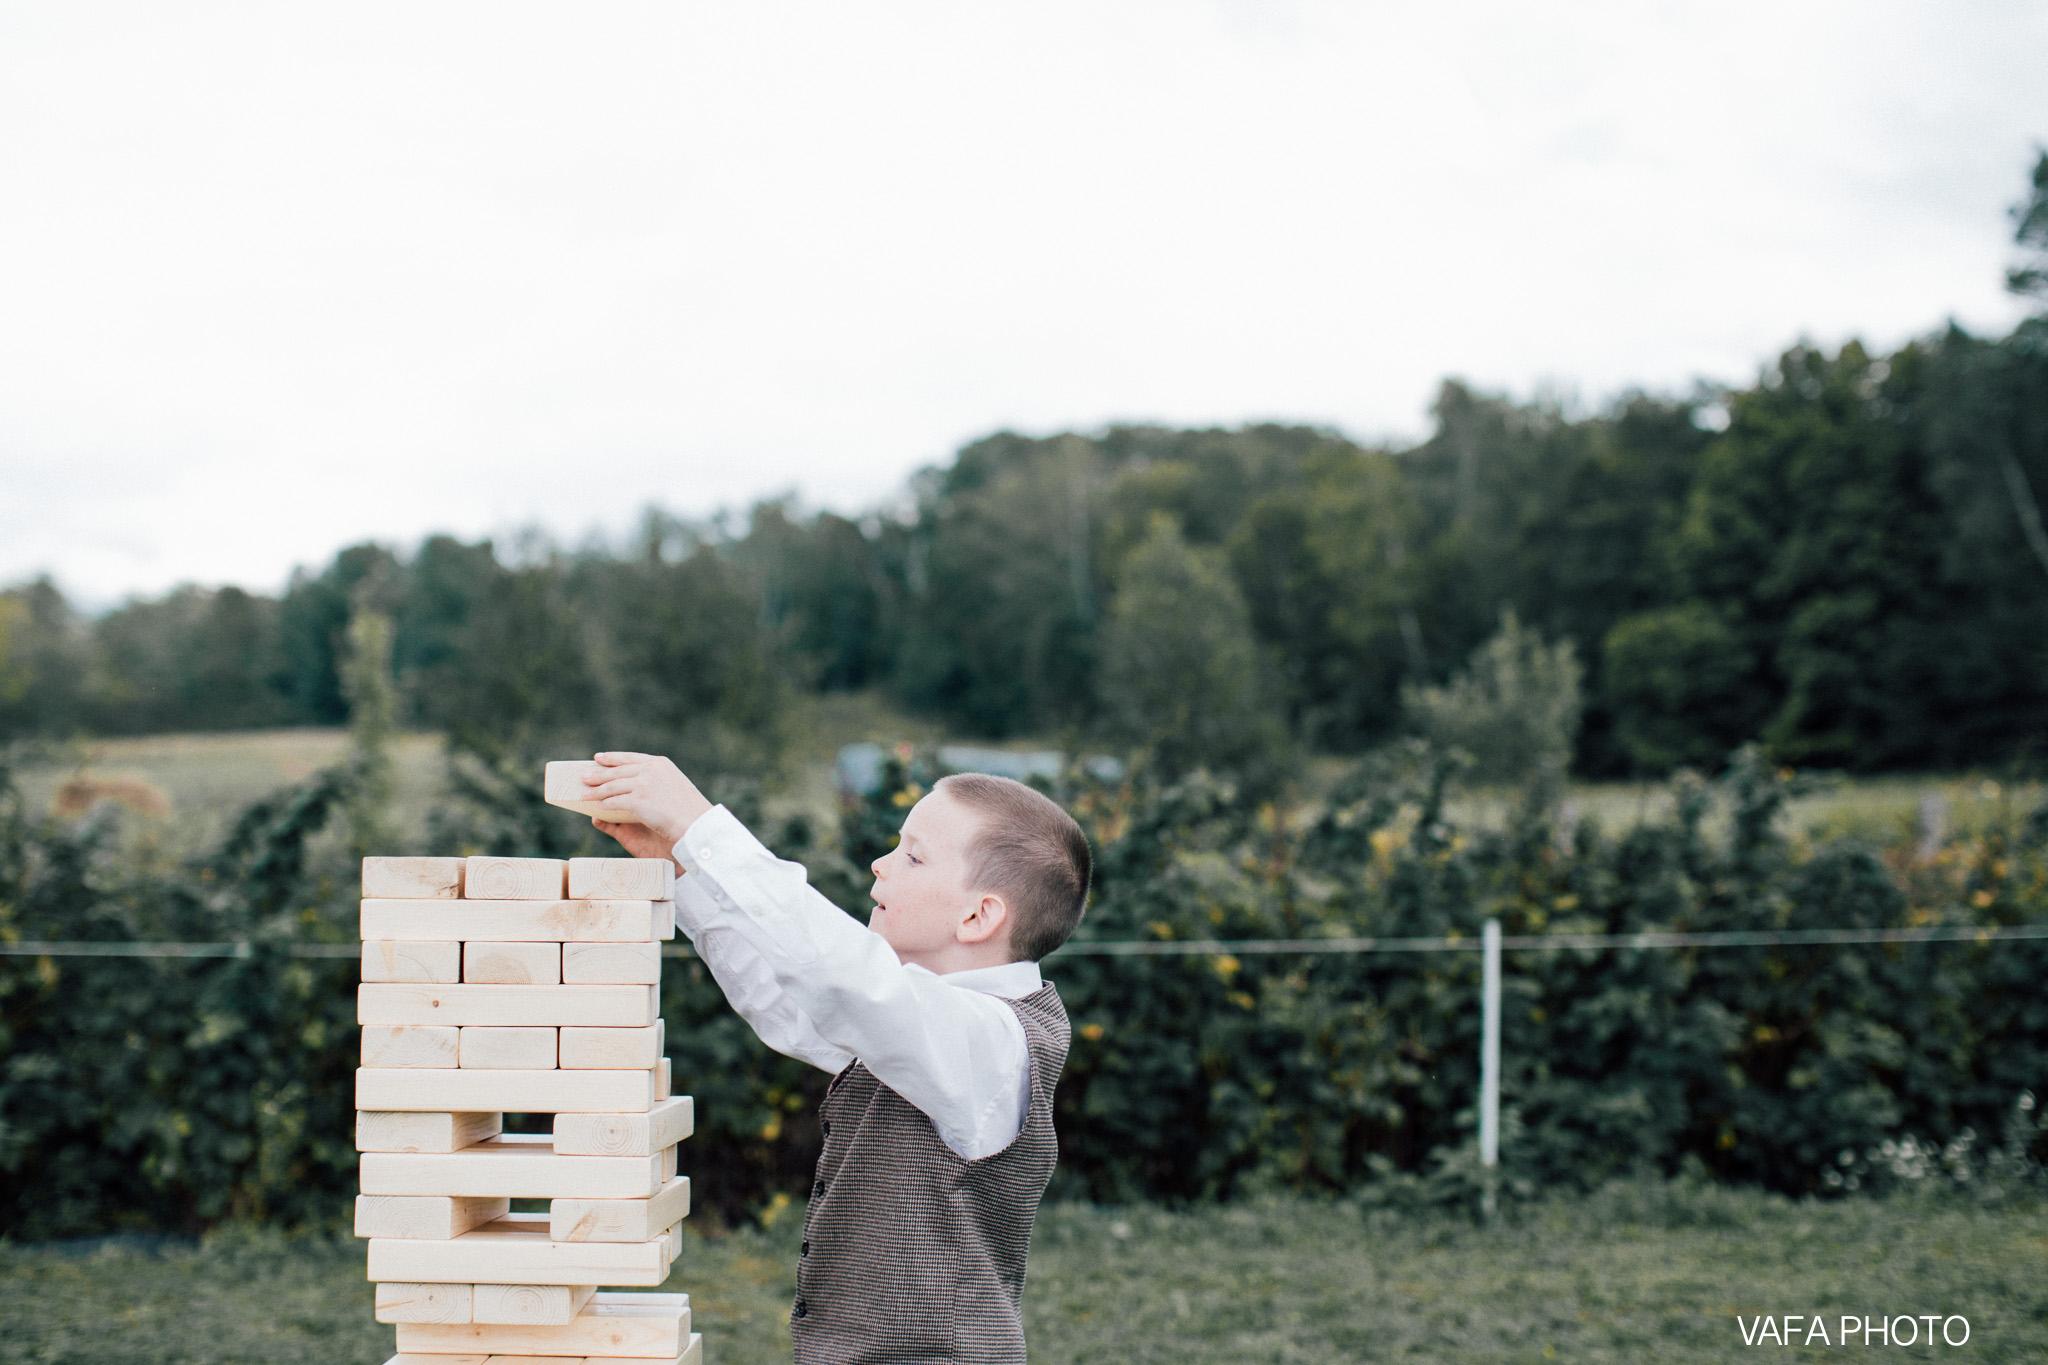 Belsolda-Farm-Wedding-Christy-Eric-Vafa-Photo-540.jpg